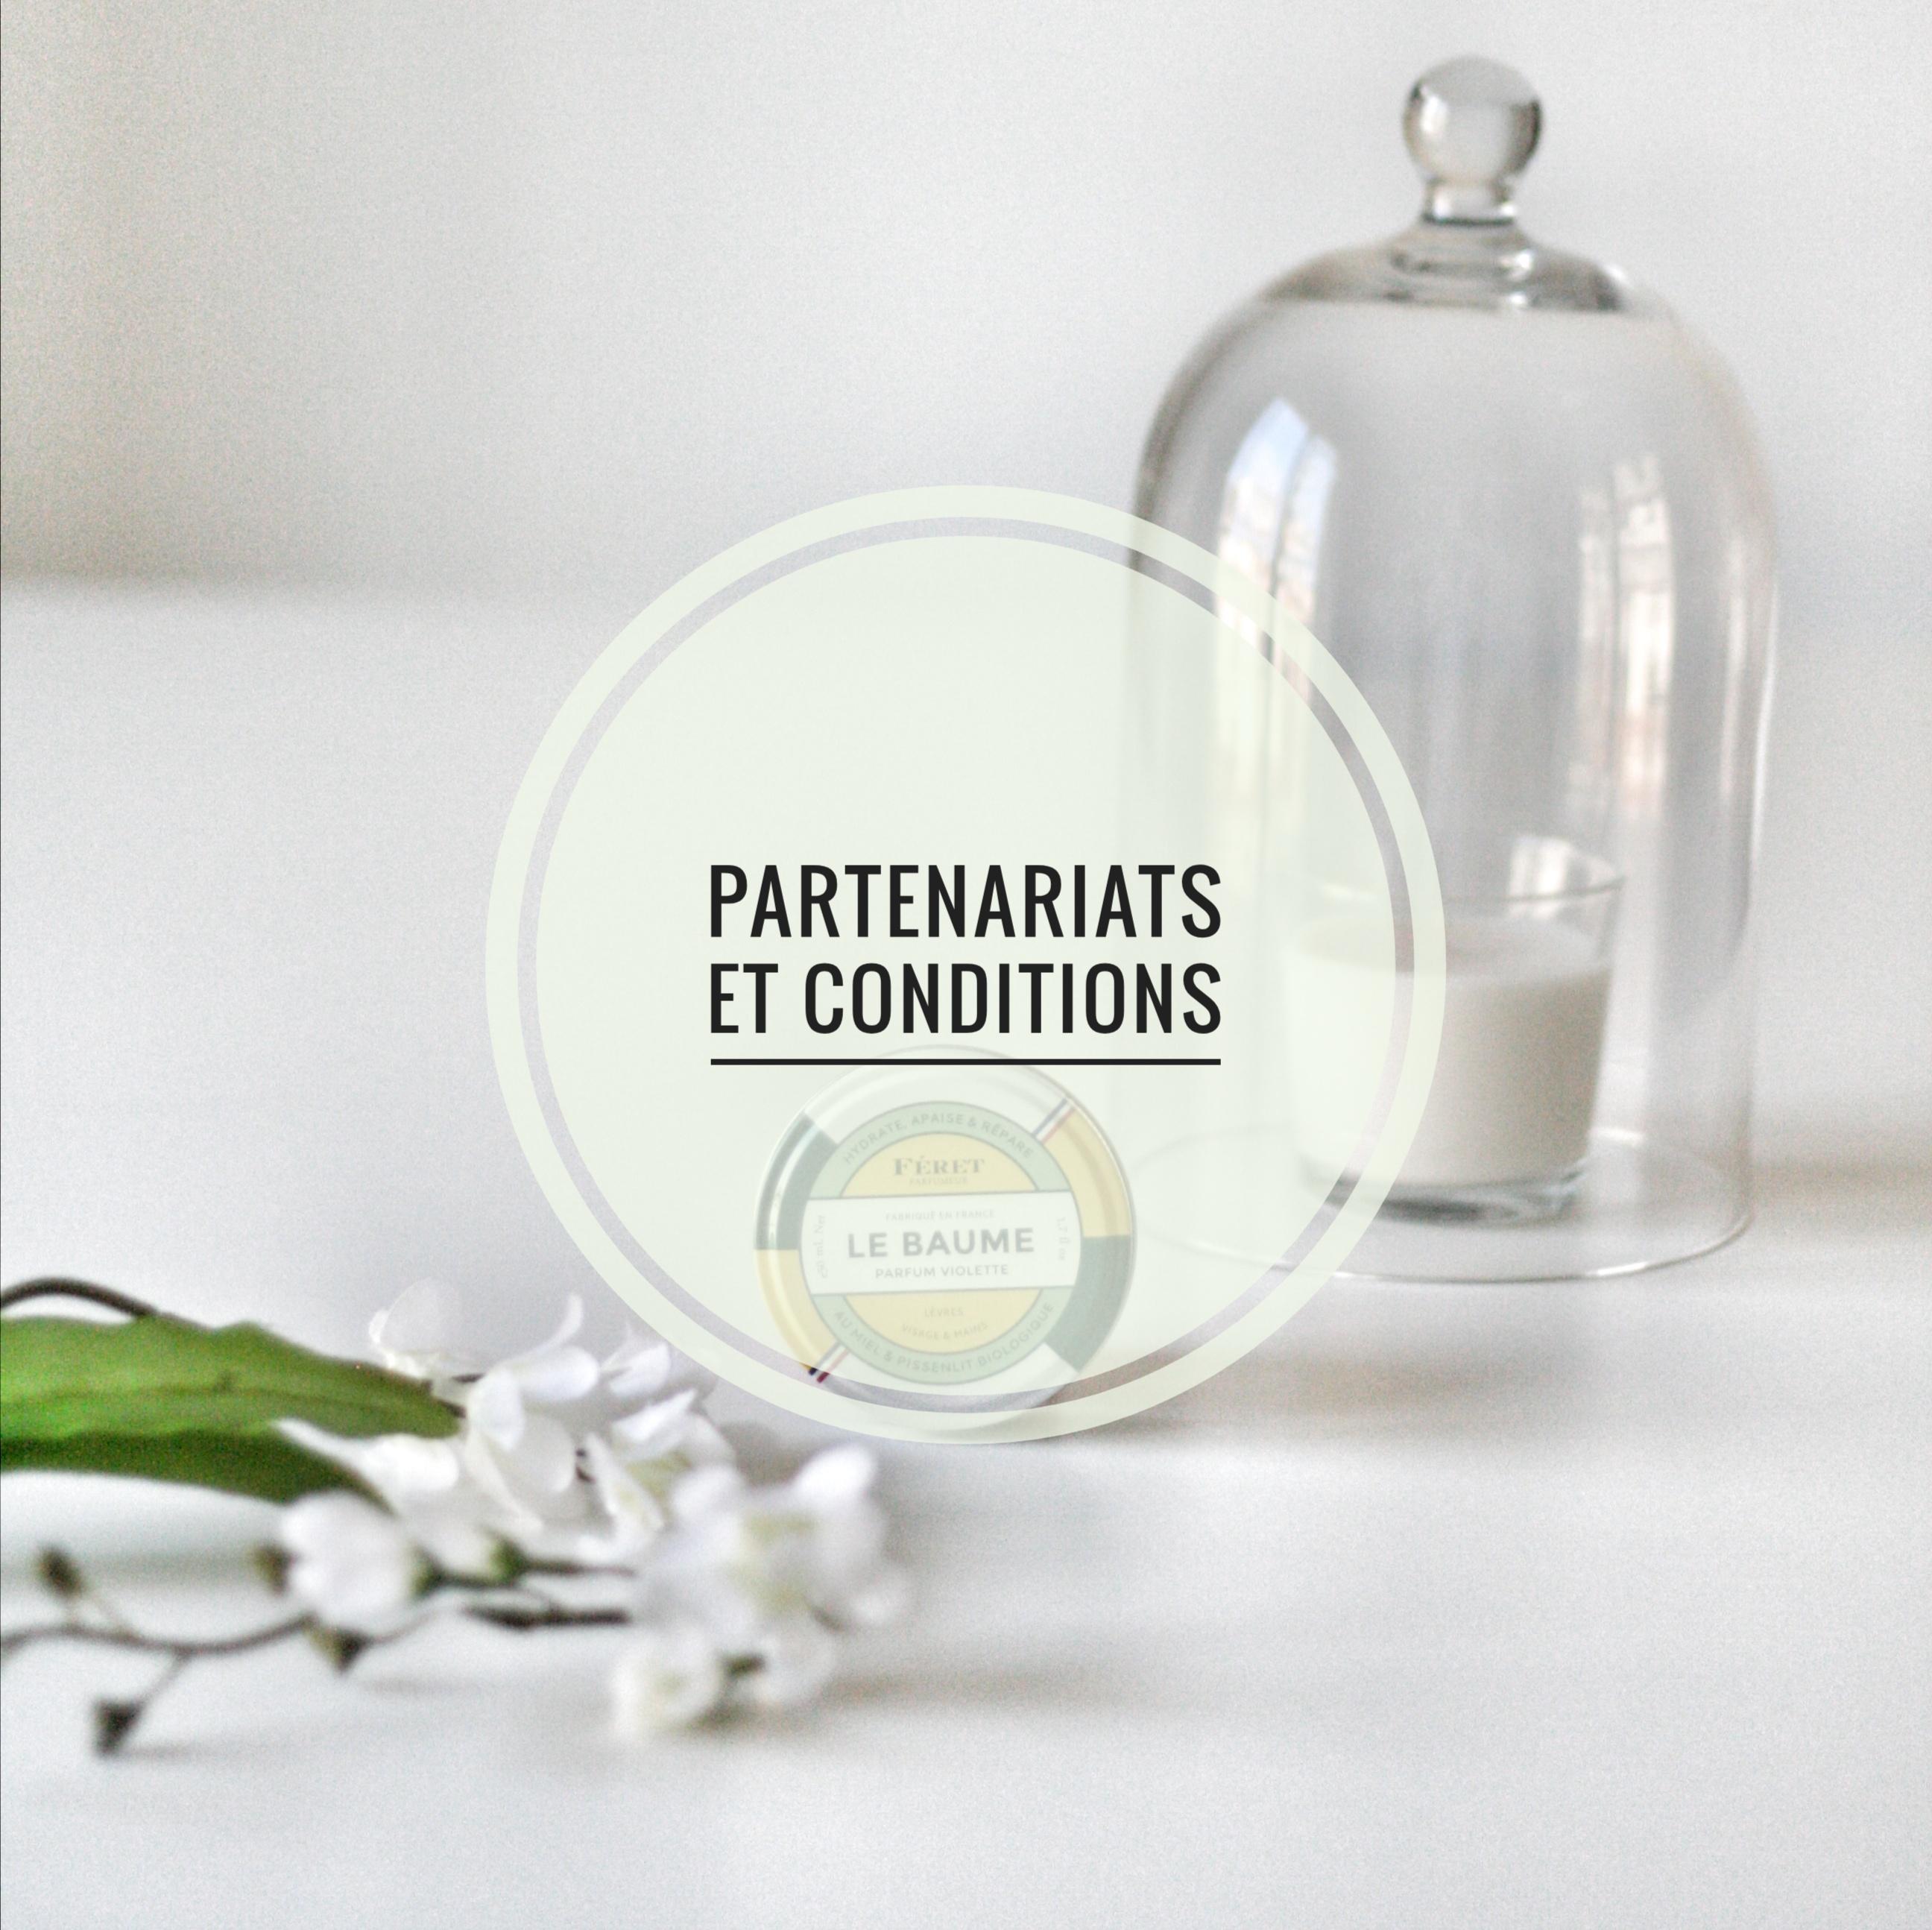 Partenariats et conditions